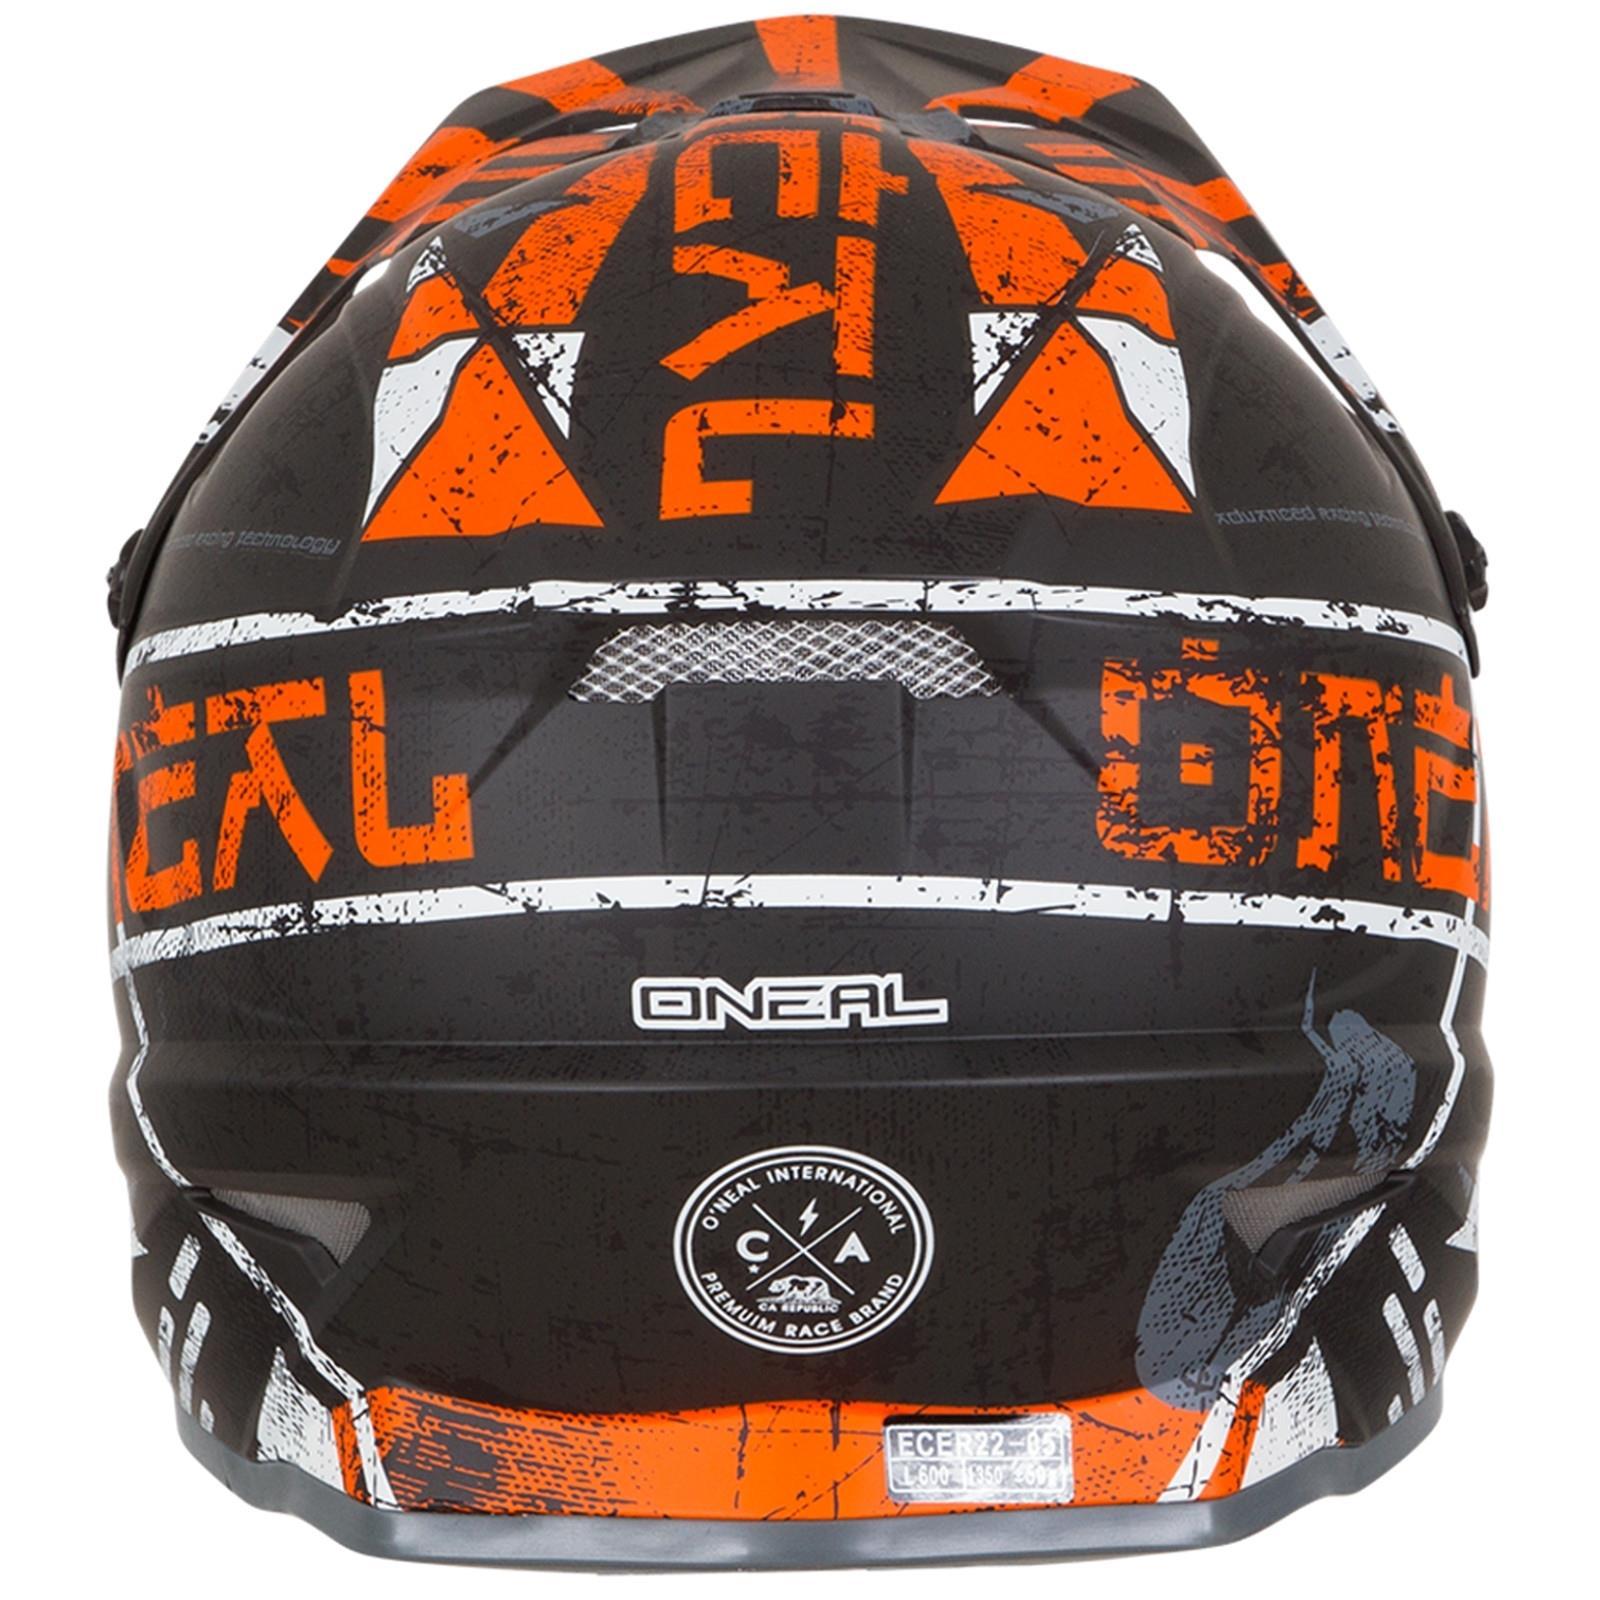 ONeal-Motocross-casco-MX-ENDURO-MOTO-BICI-FUORISTRADA-CROSS-Series-Adventure miniatura 31